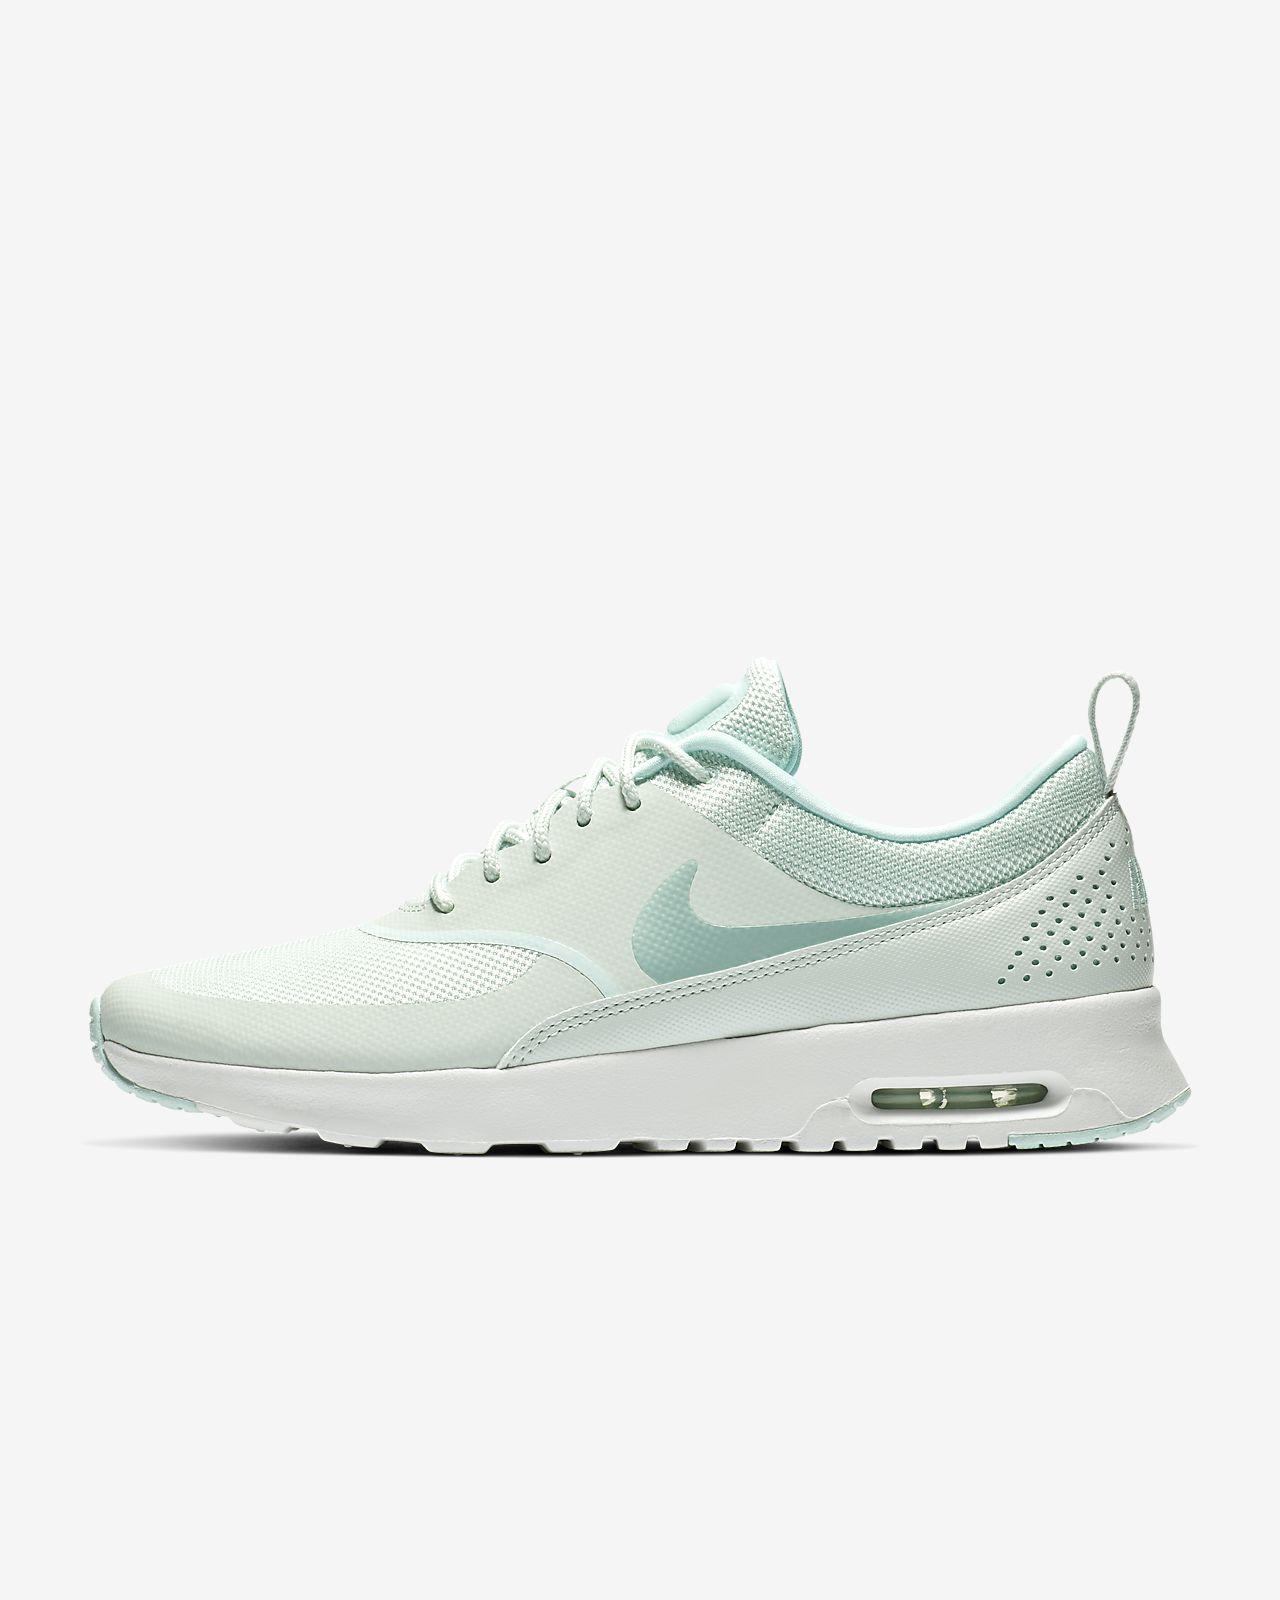 huge discount dd73f 55b91 ... Nike Air Max Thea - sko til kvinder